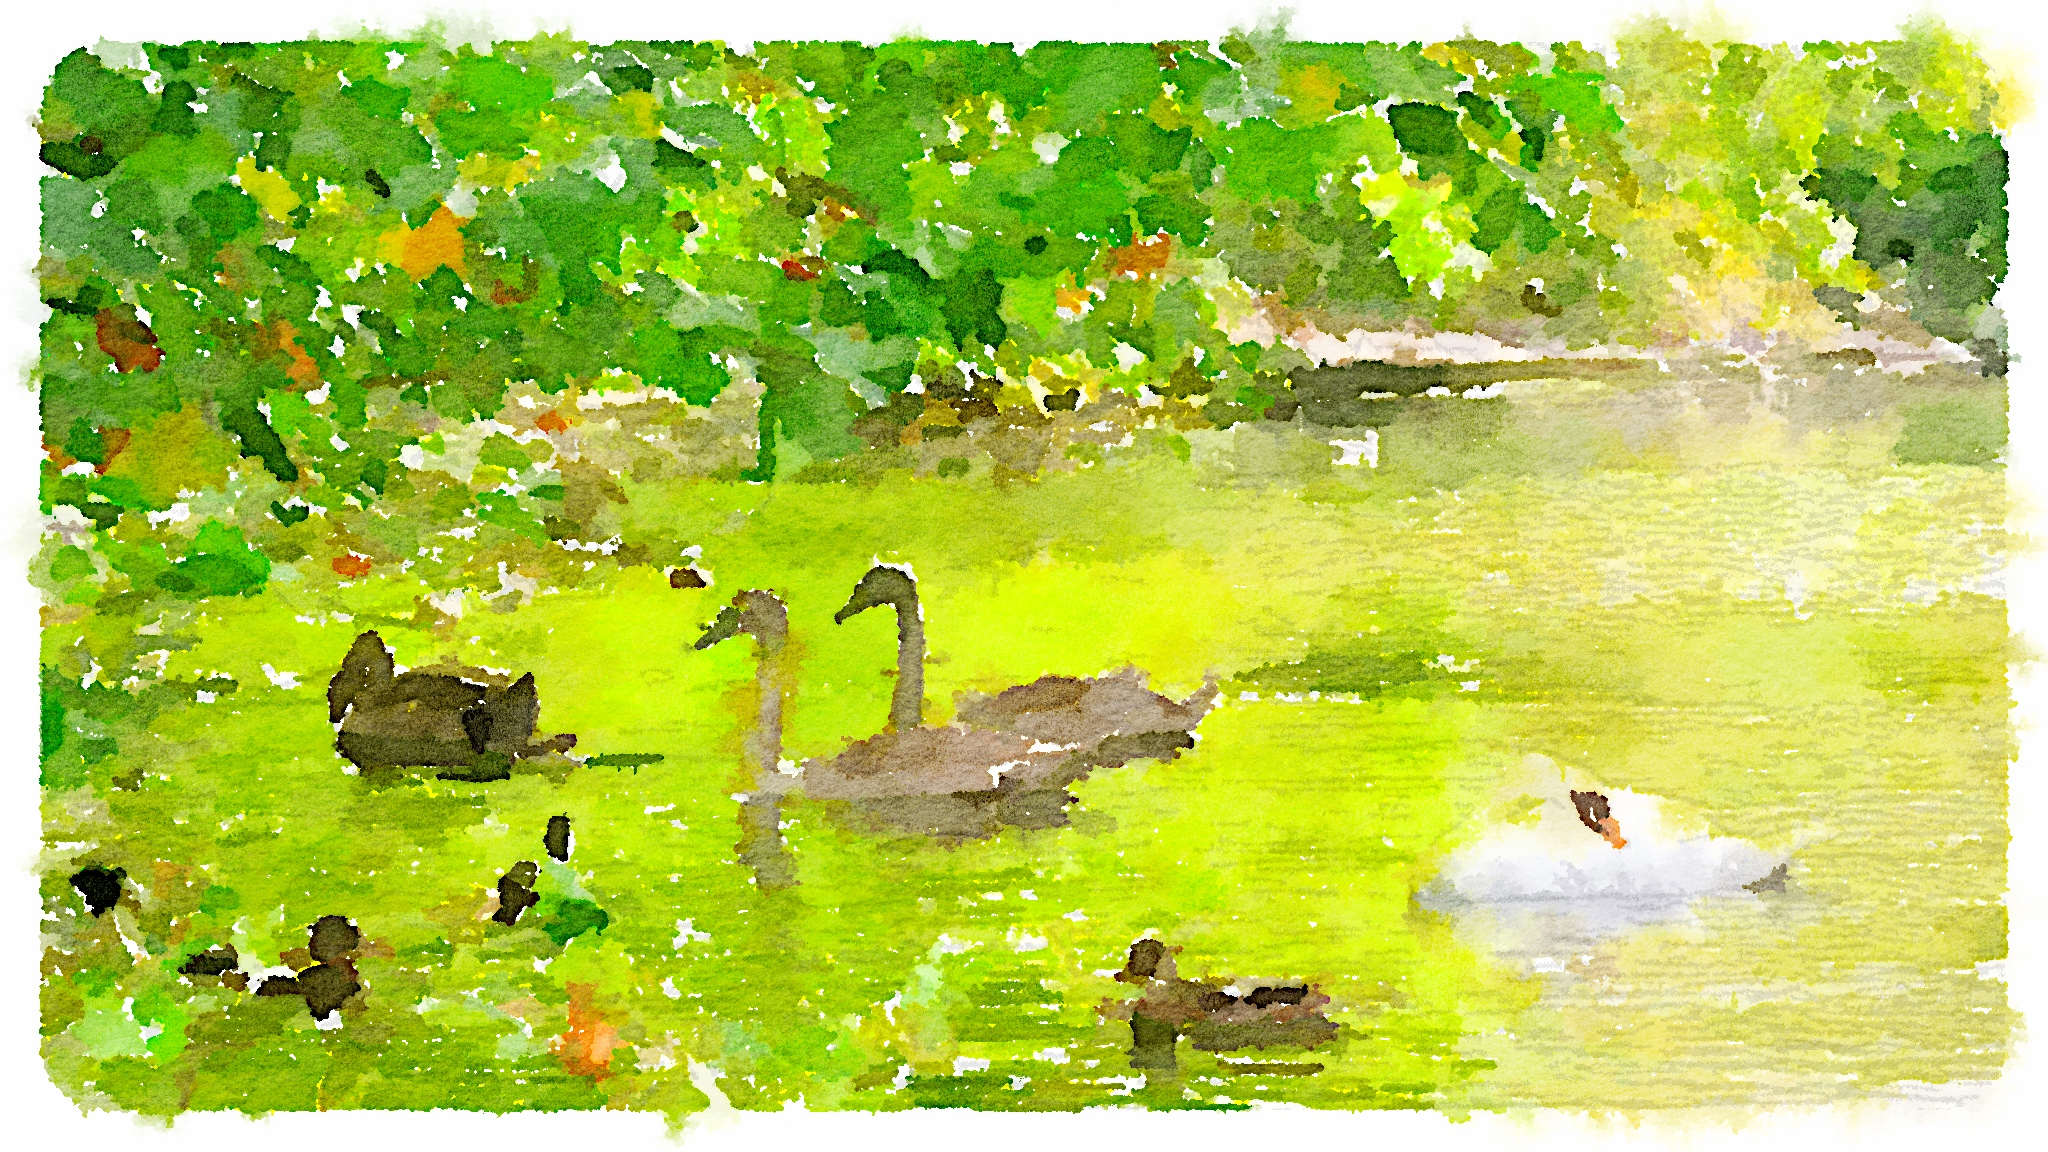 St. Stephens Green swans